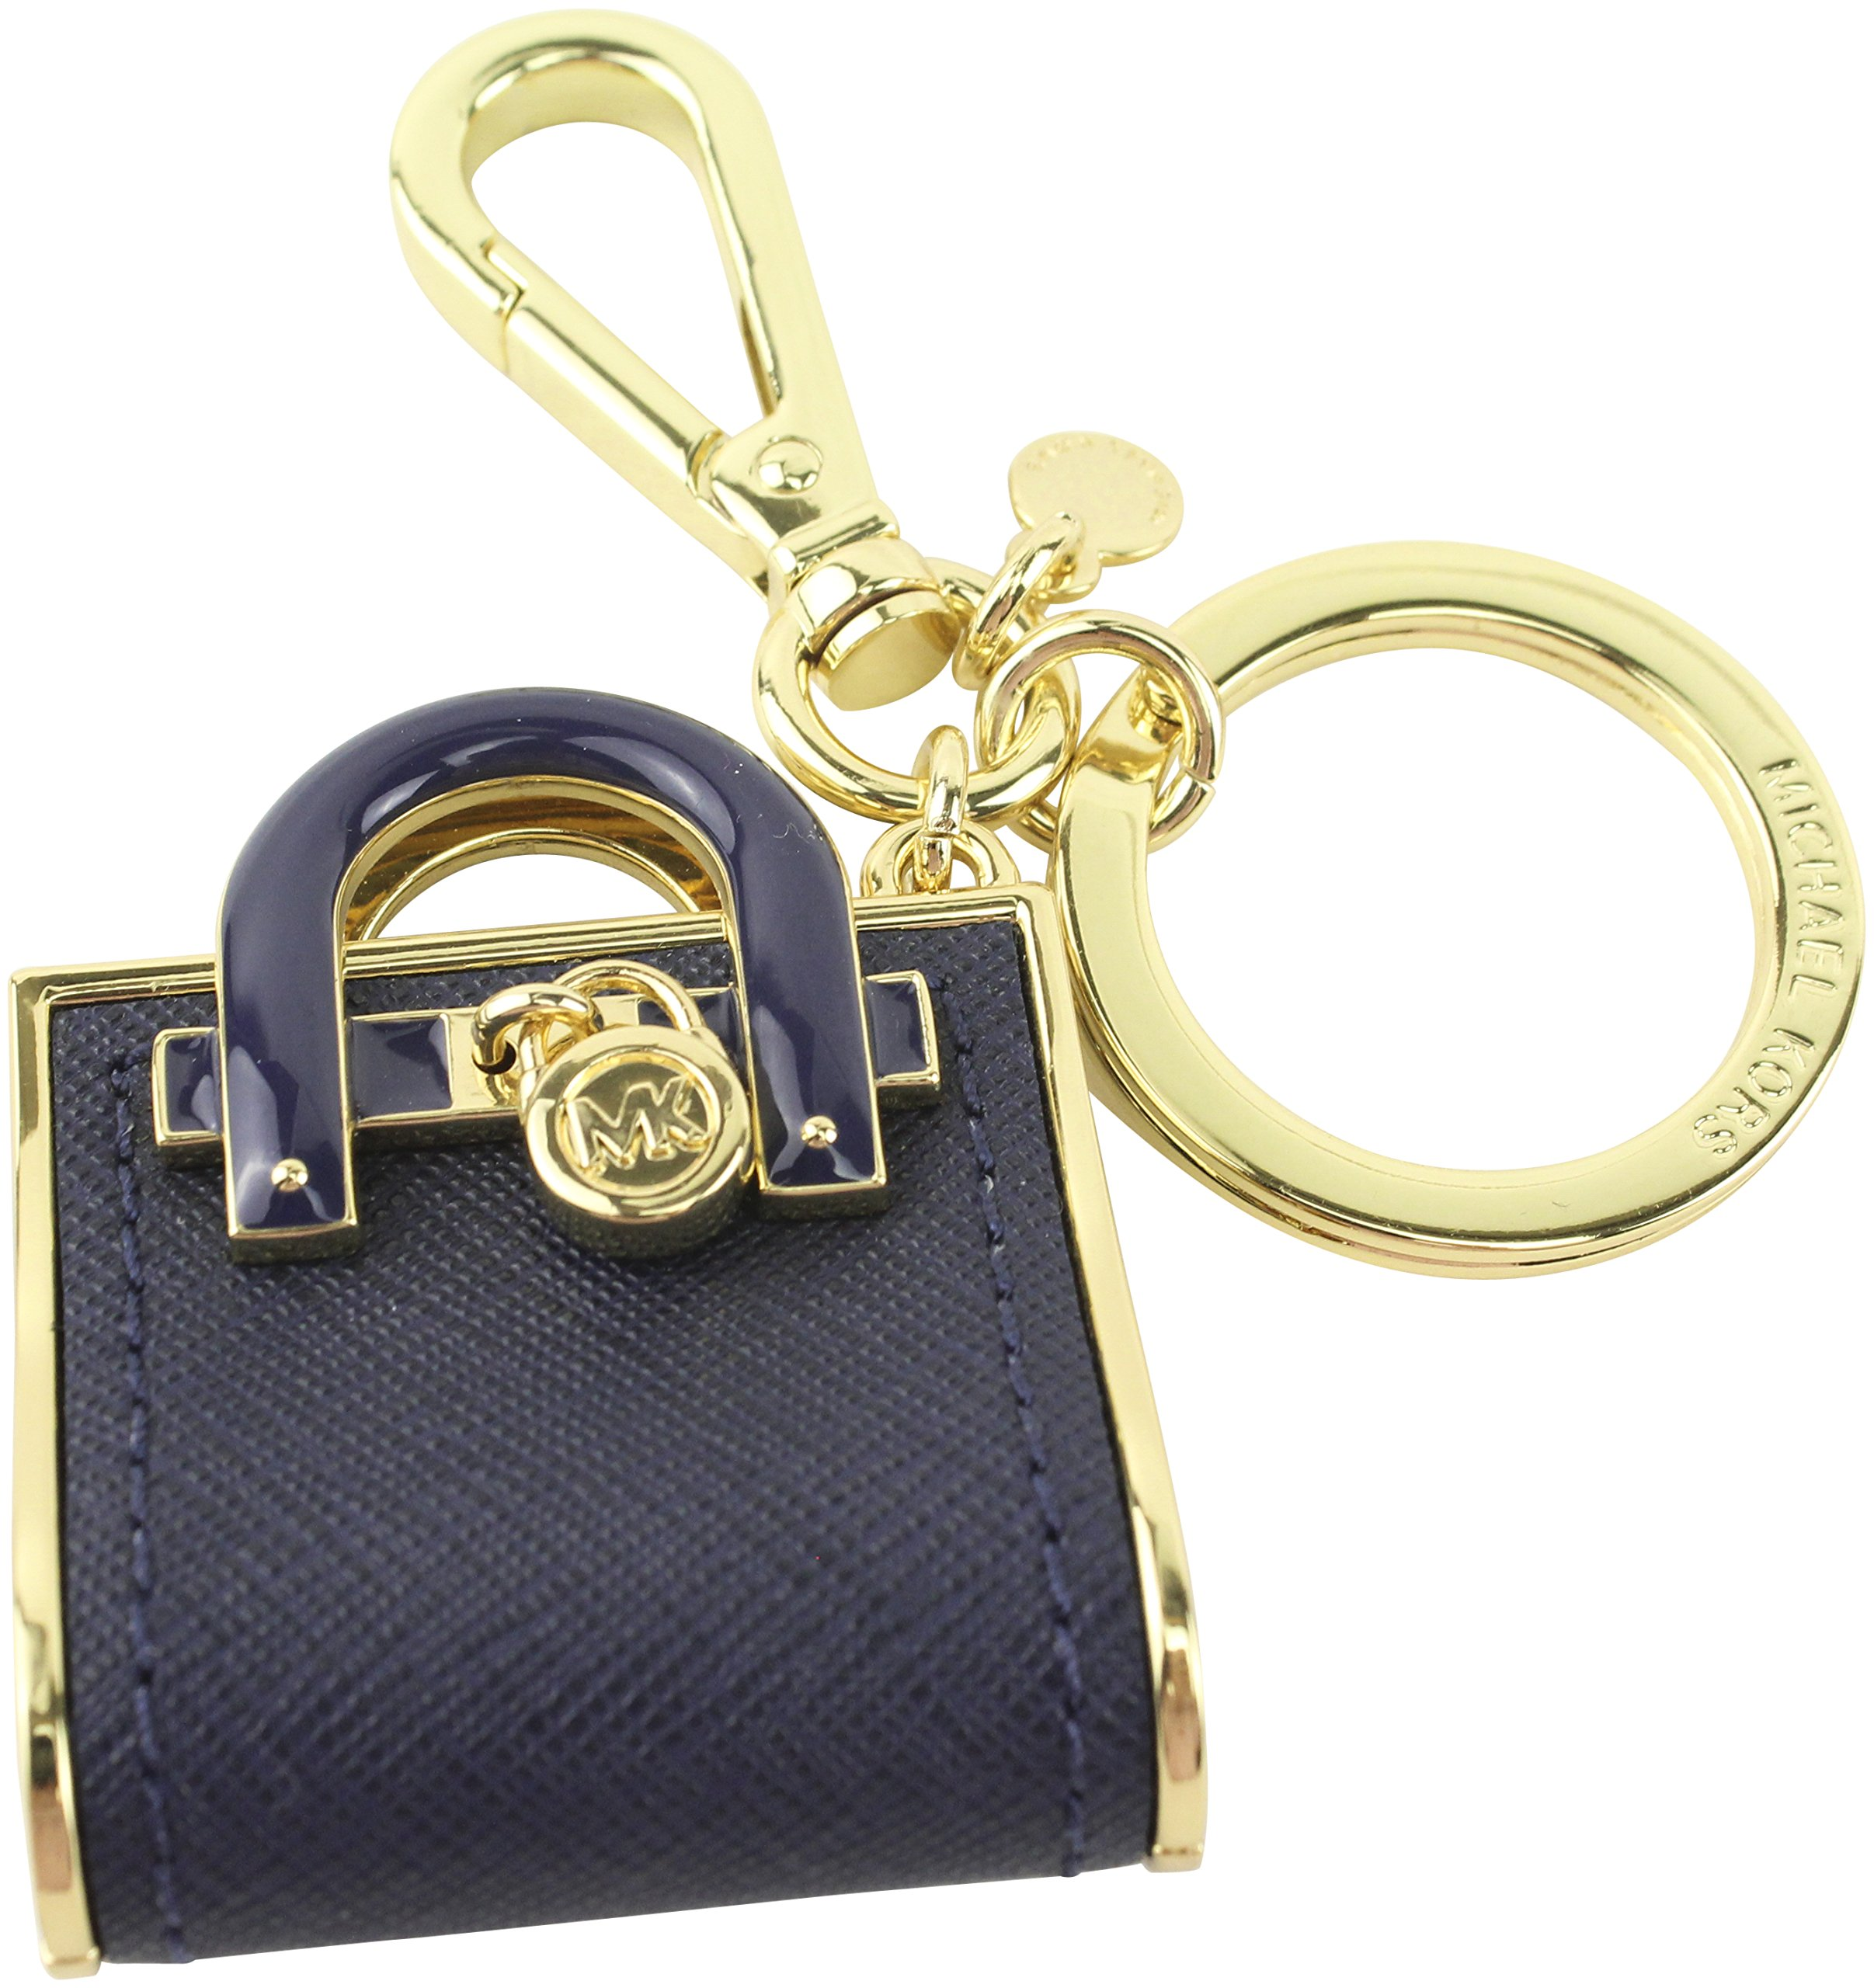 Michael Kors Hamilton Mk Hand Bag Key Charm Fob / Purse Charms Onse Size Navy